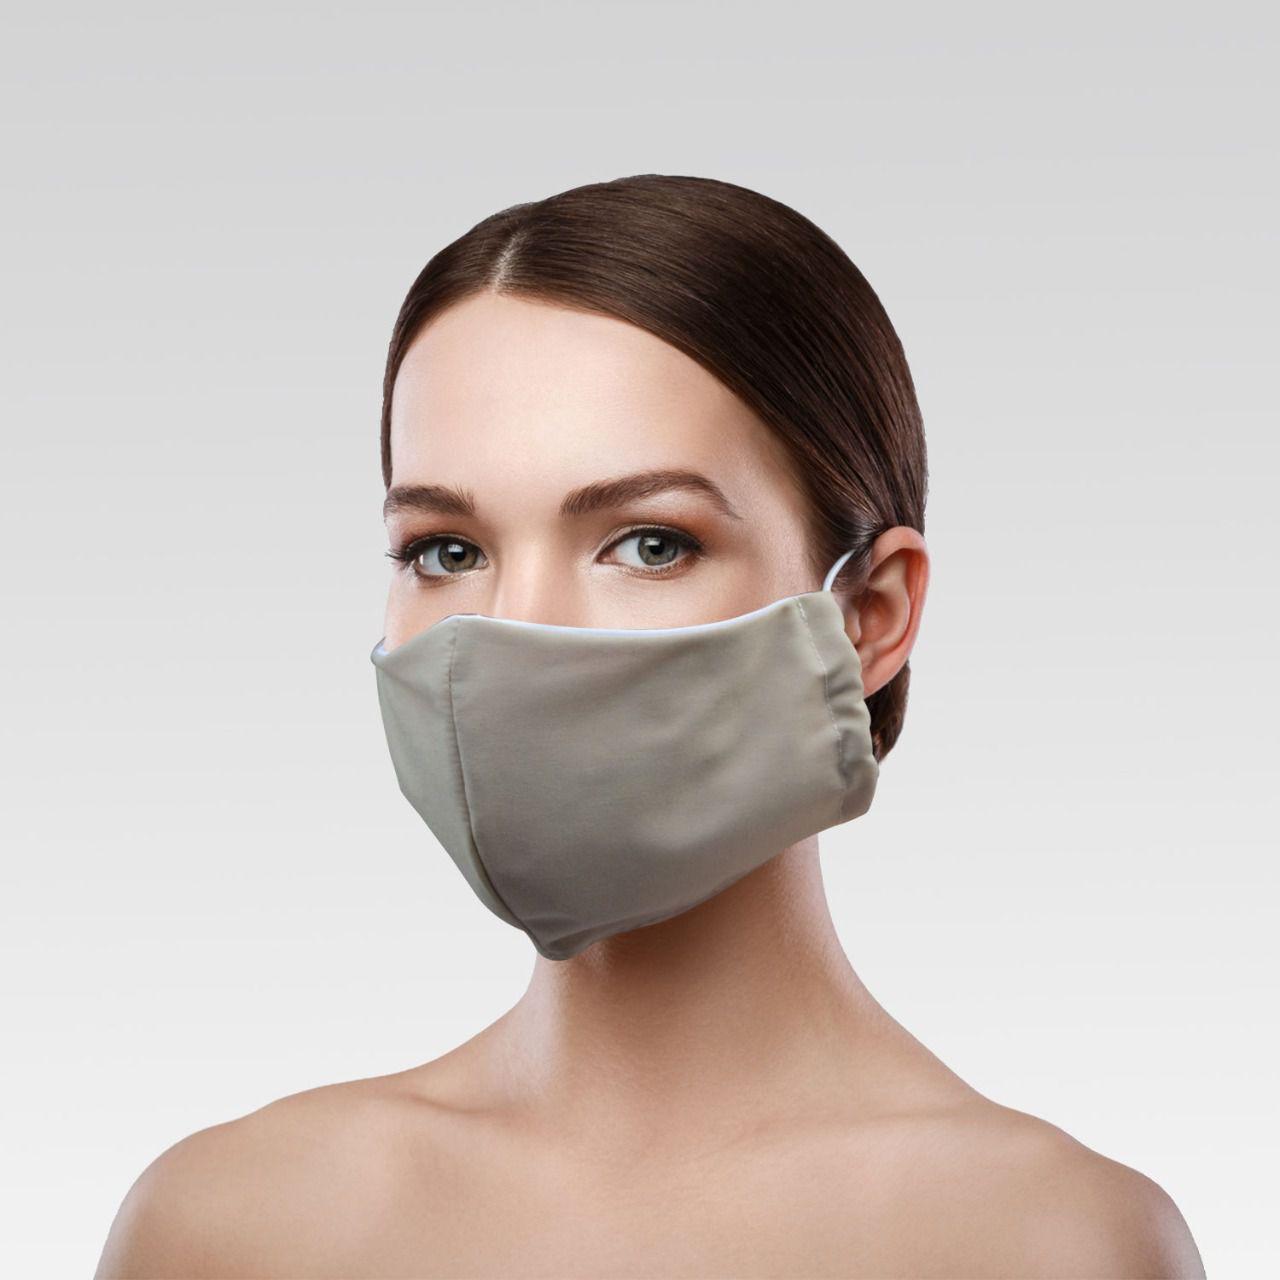 Máscara Unissex de Proteção para Imunidade - Bege Escuro Lisa